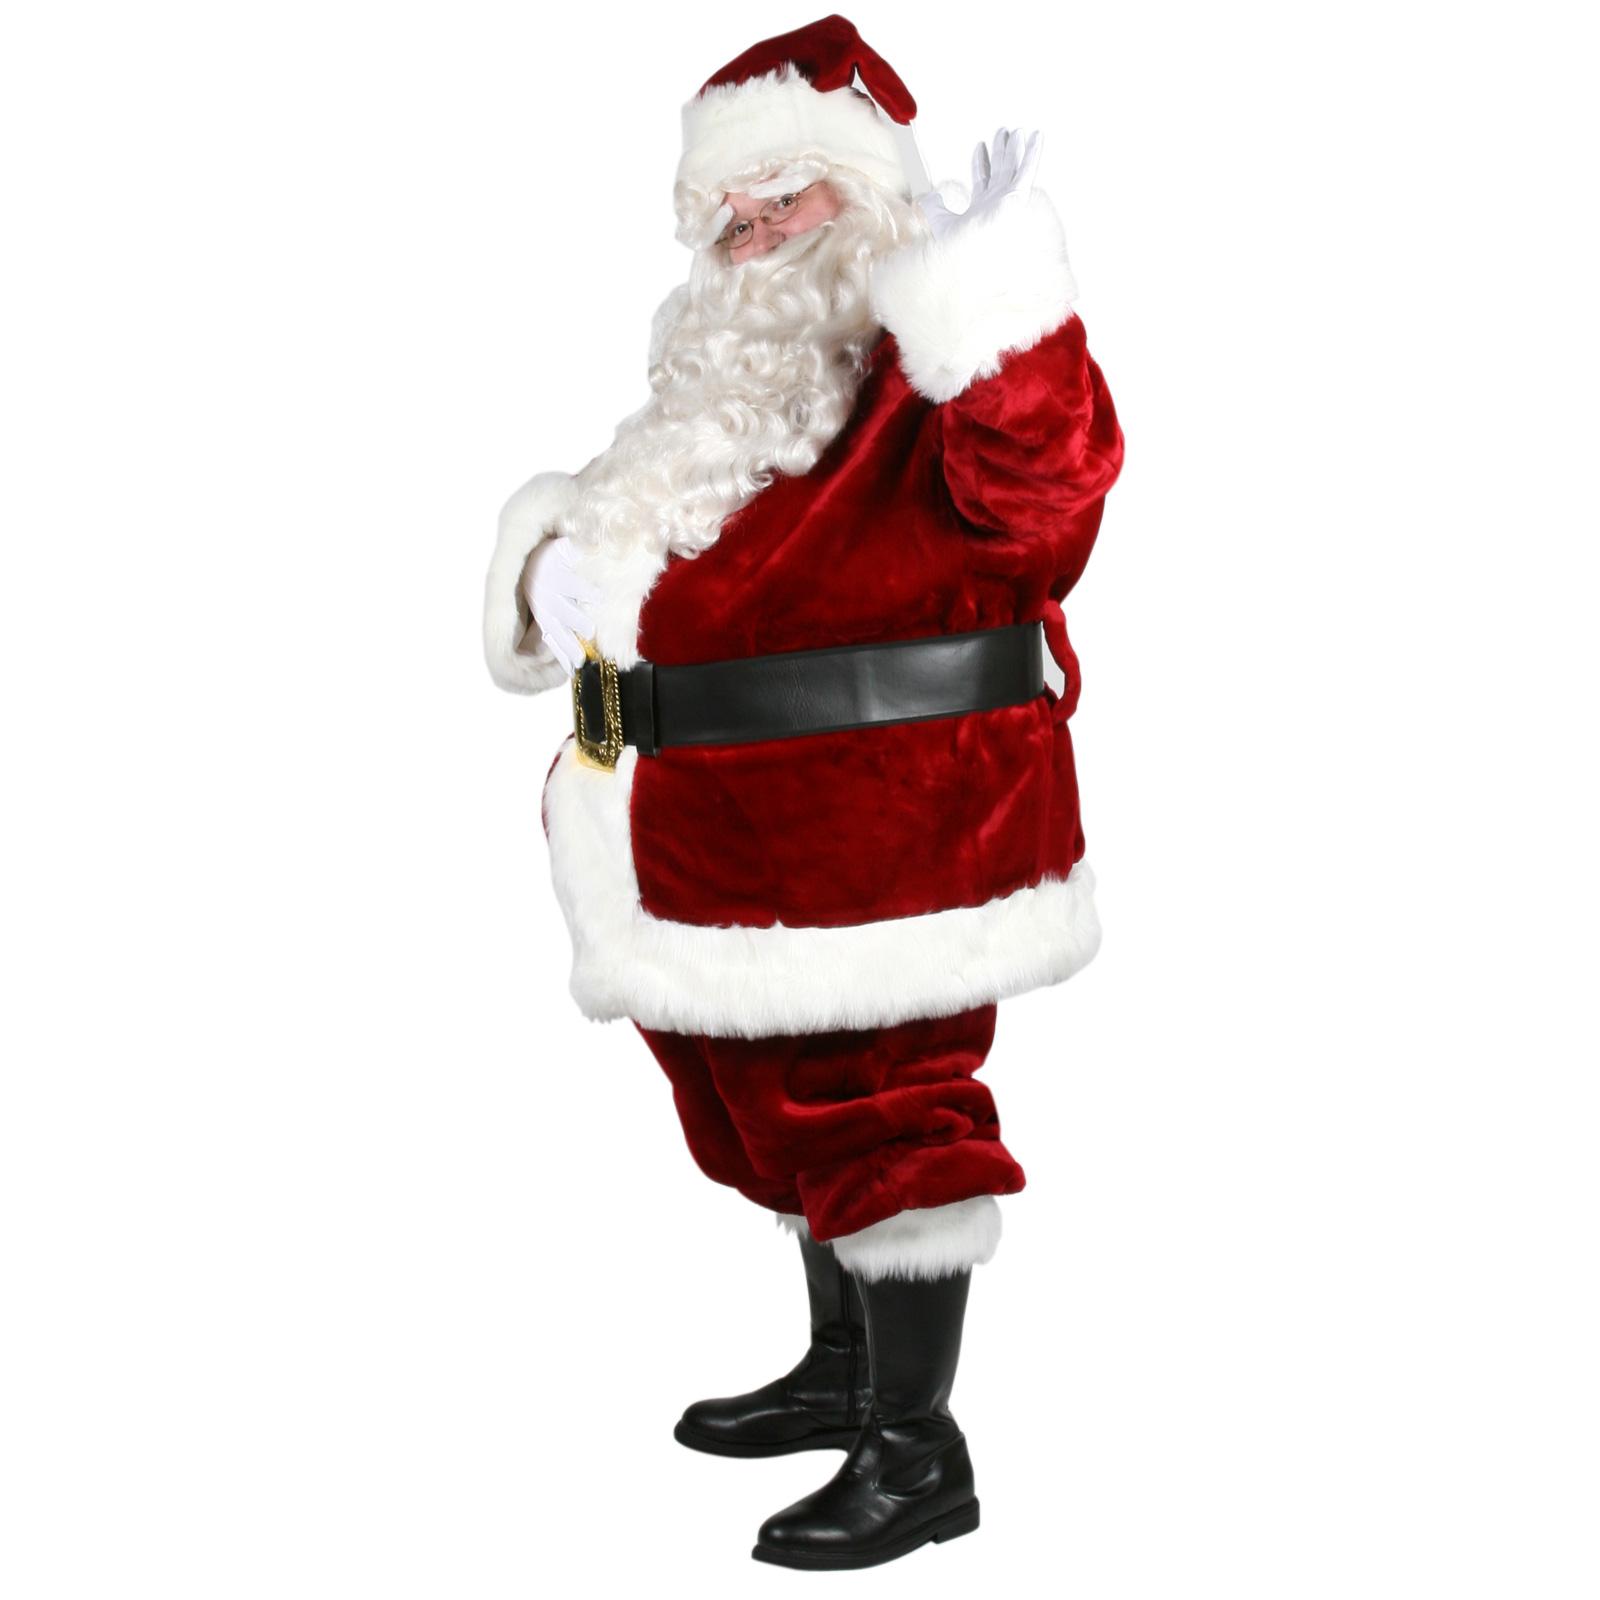 Majestic Santa Suit Plus Size Costume (Size 58-62) | BuyCostumes.com